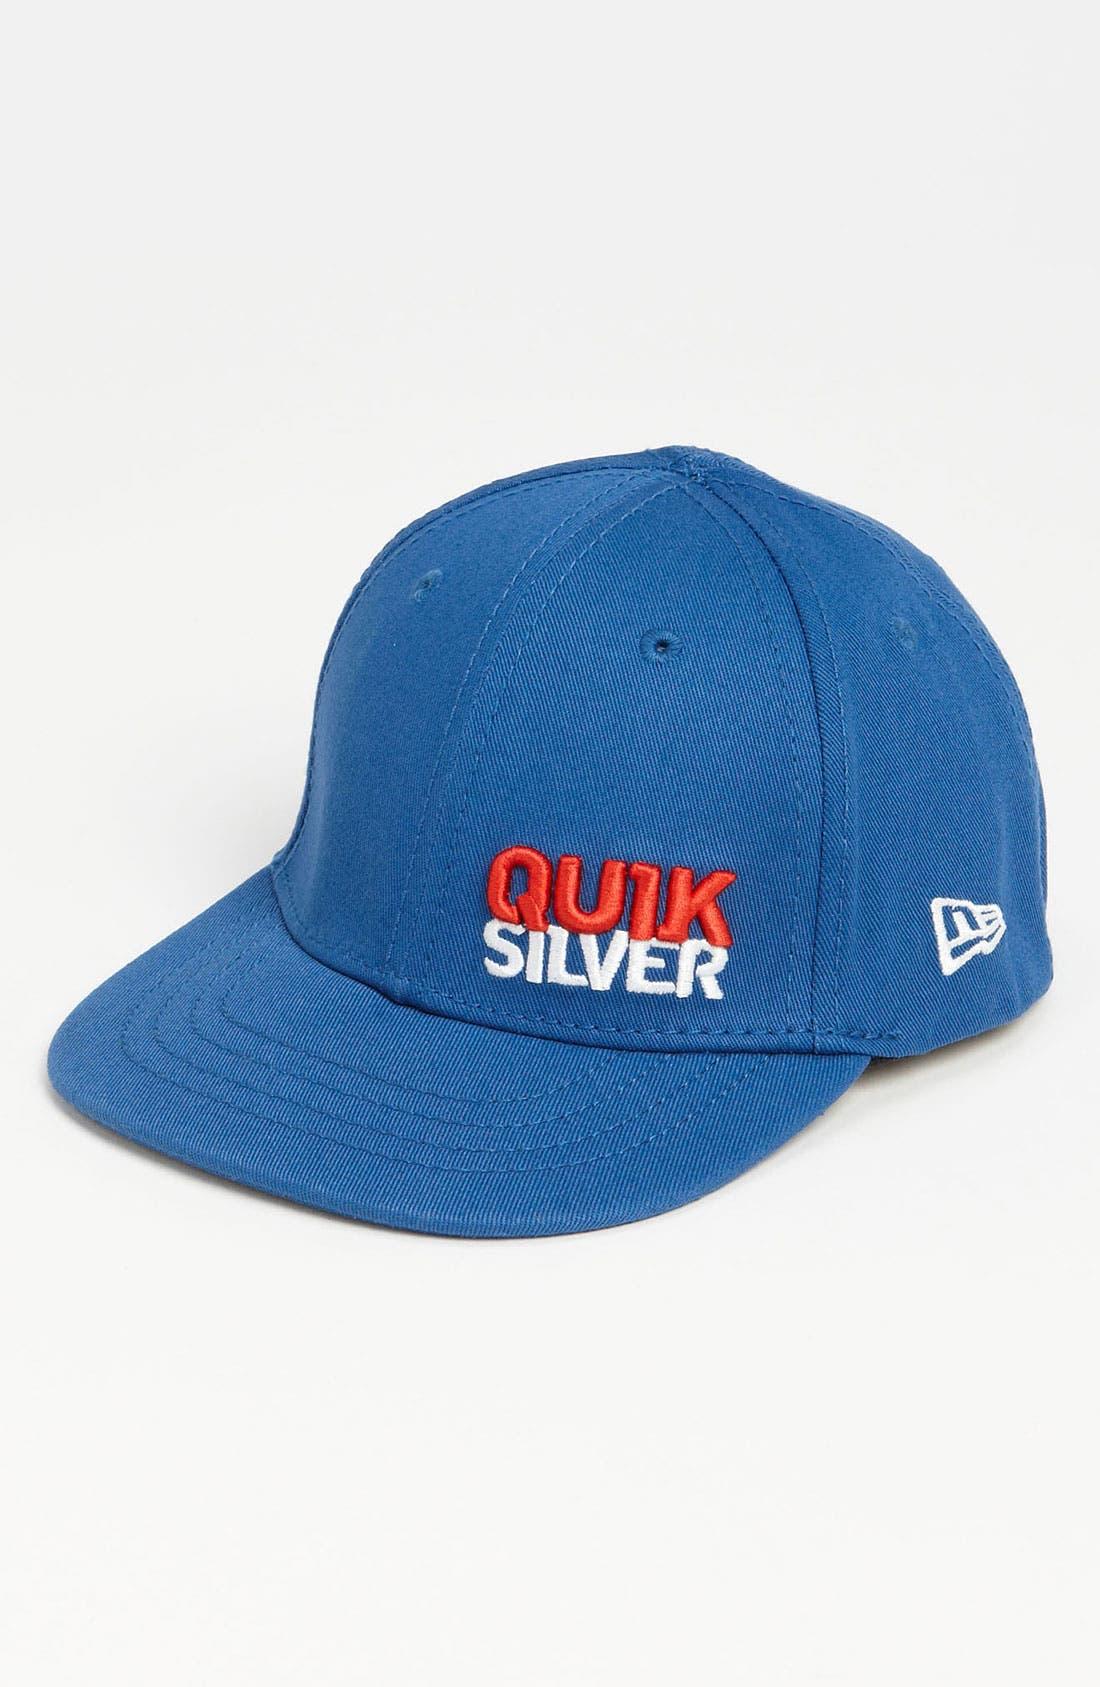 Alternate Image 1 Selected - Quiksilver 'Strands' Baseball Cap (Toddler)